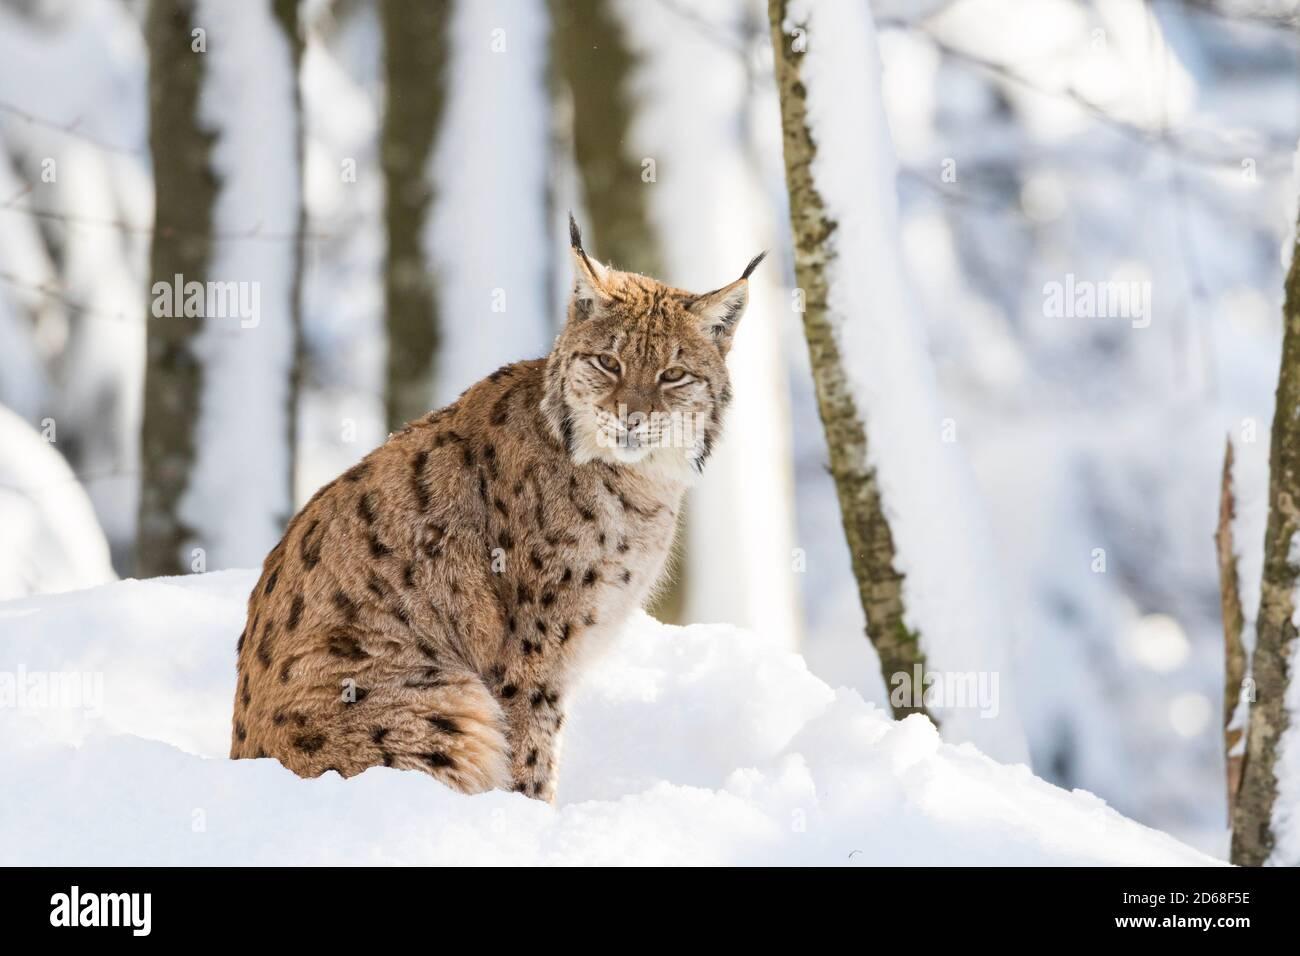 Eurasian lynx (Lynx lynx )  during winter in  National Park Bavarian Forest (Bayerischer Wald). Europe, Central Europe, Germany, Bavaria, January Stock Photo